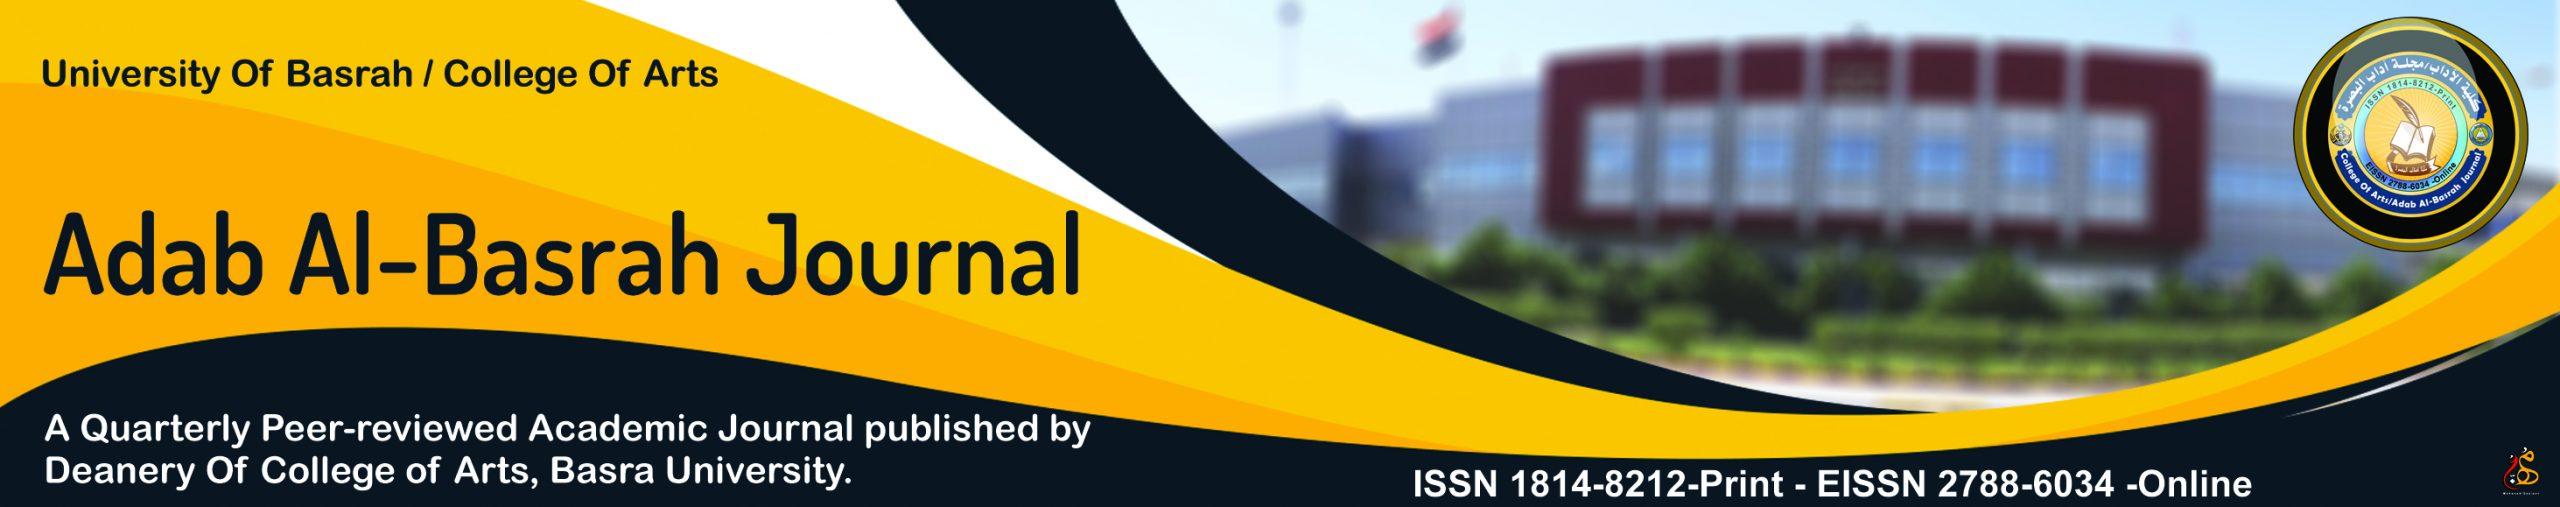 Adab Albasra Journal